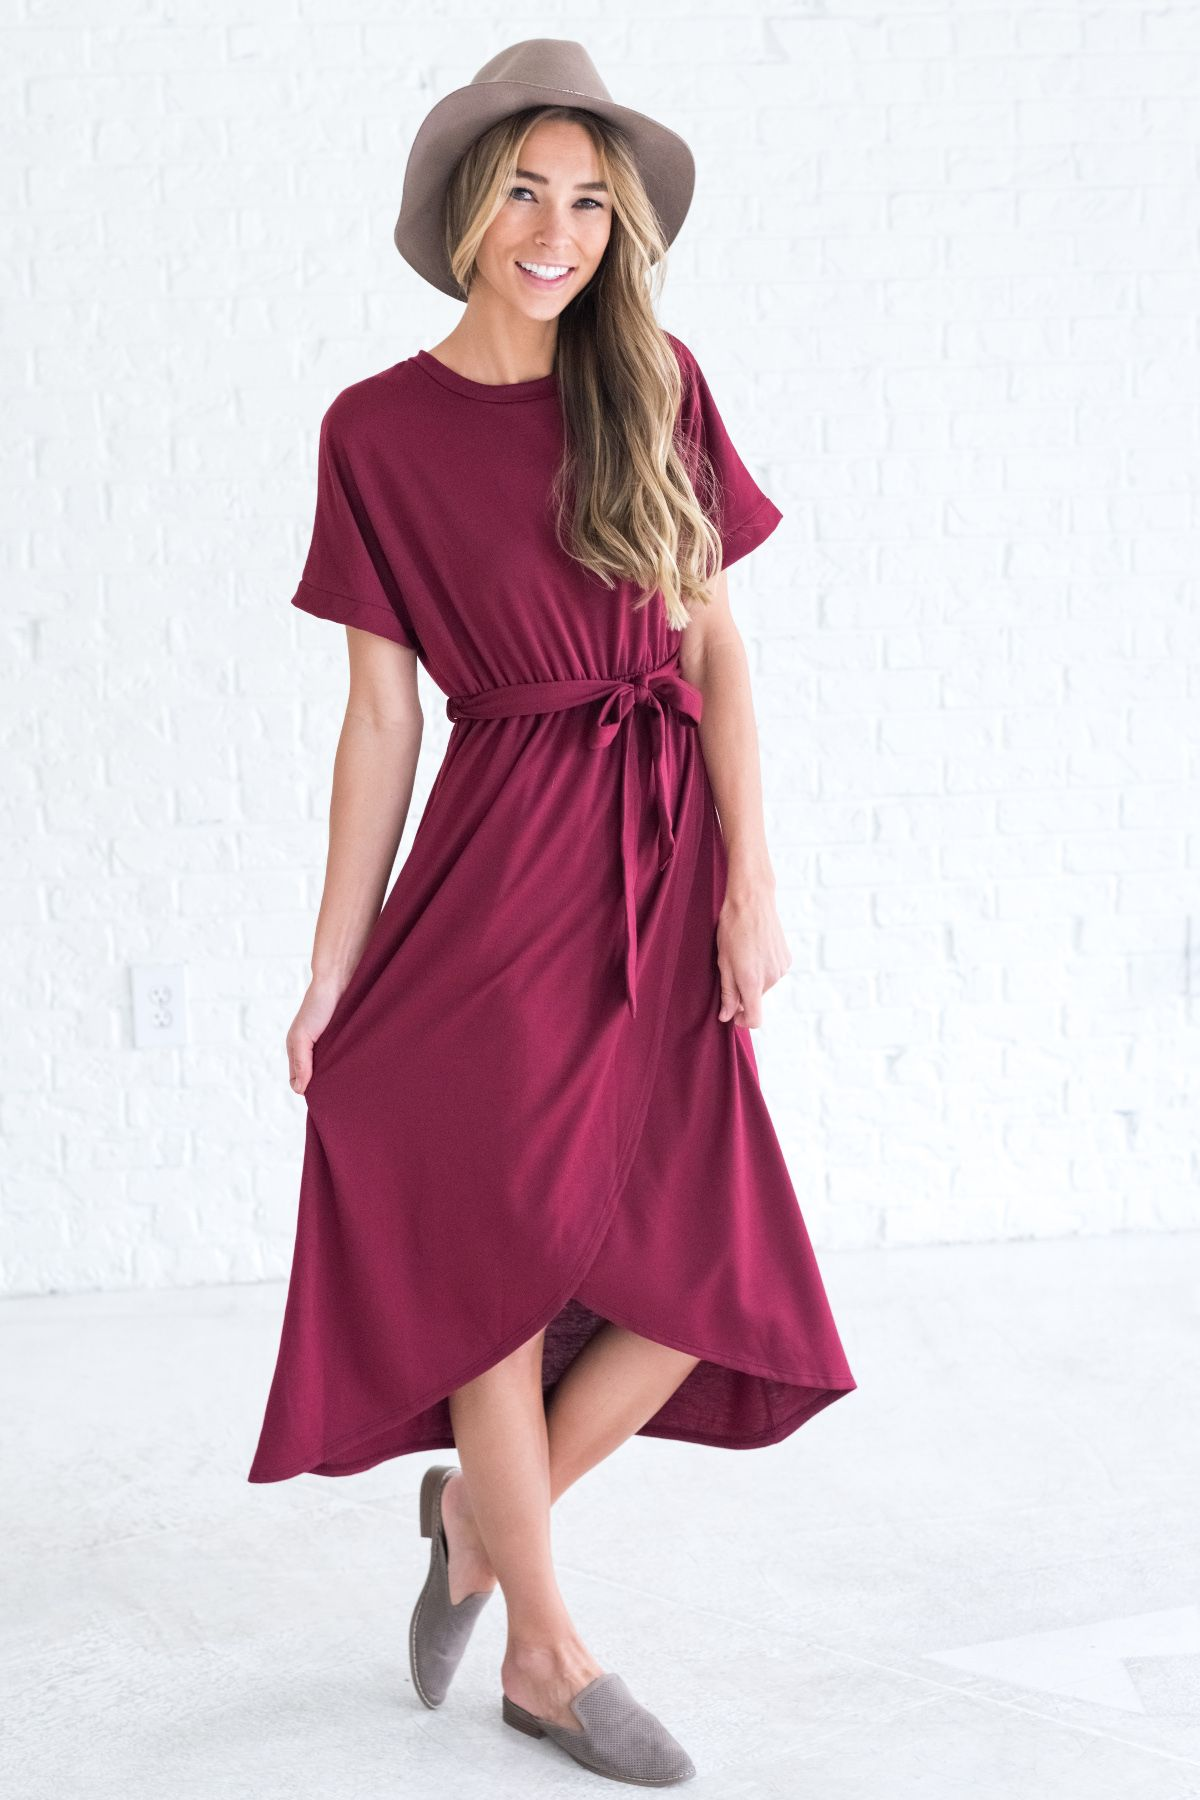 d27929b9458927 Happiness Looks Beautiful Burgundy Dress